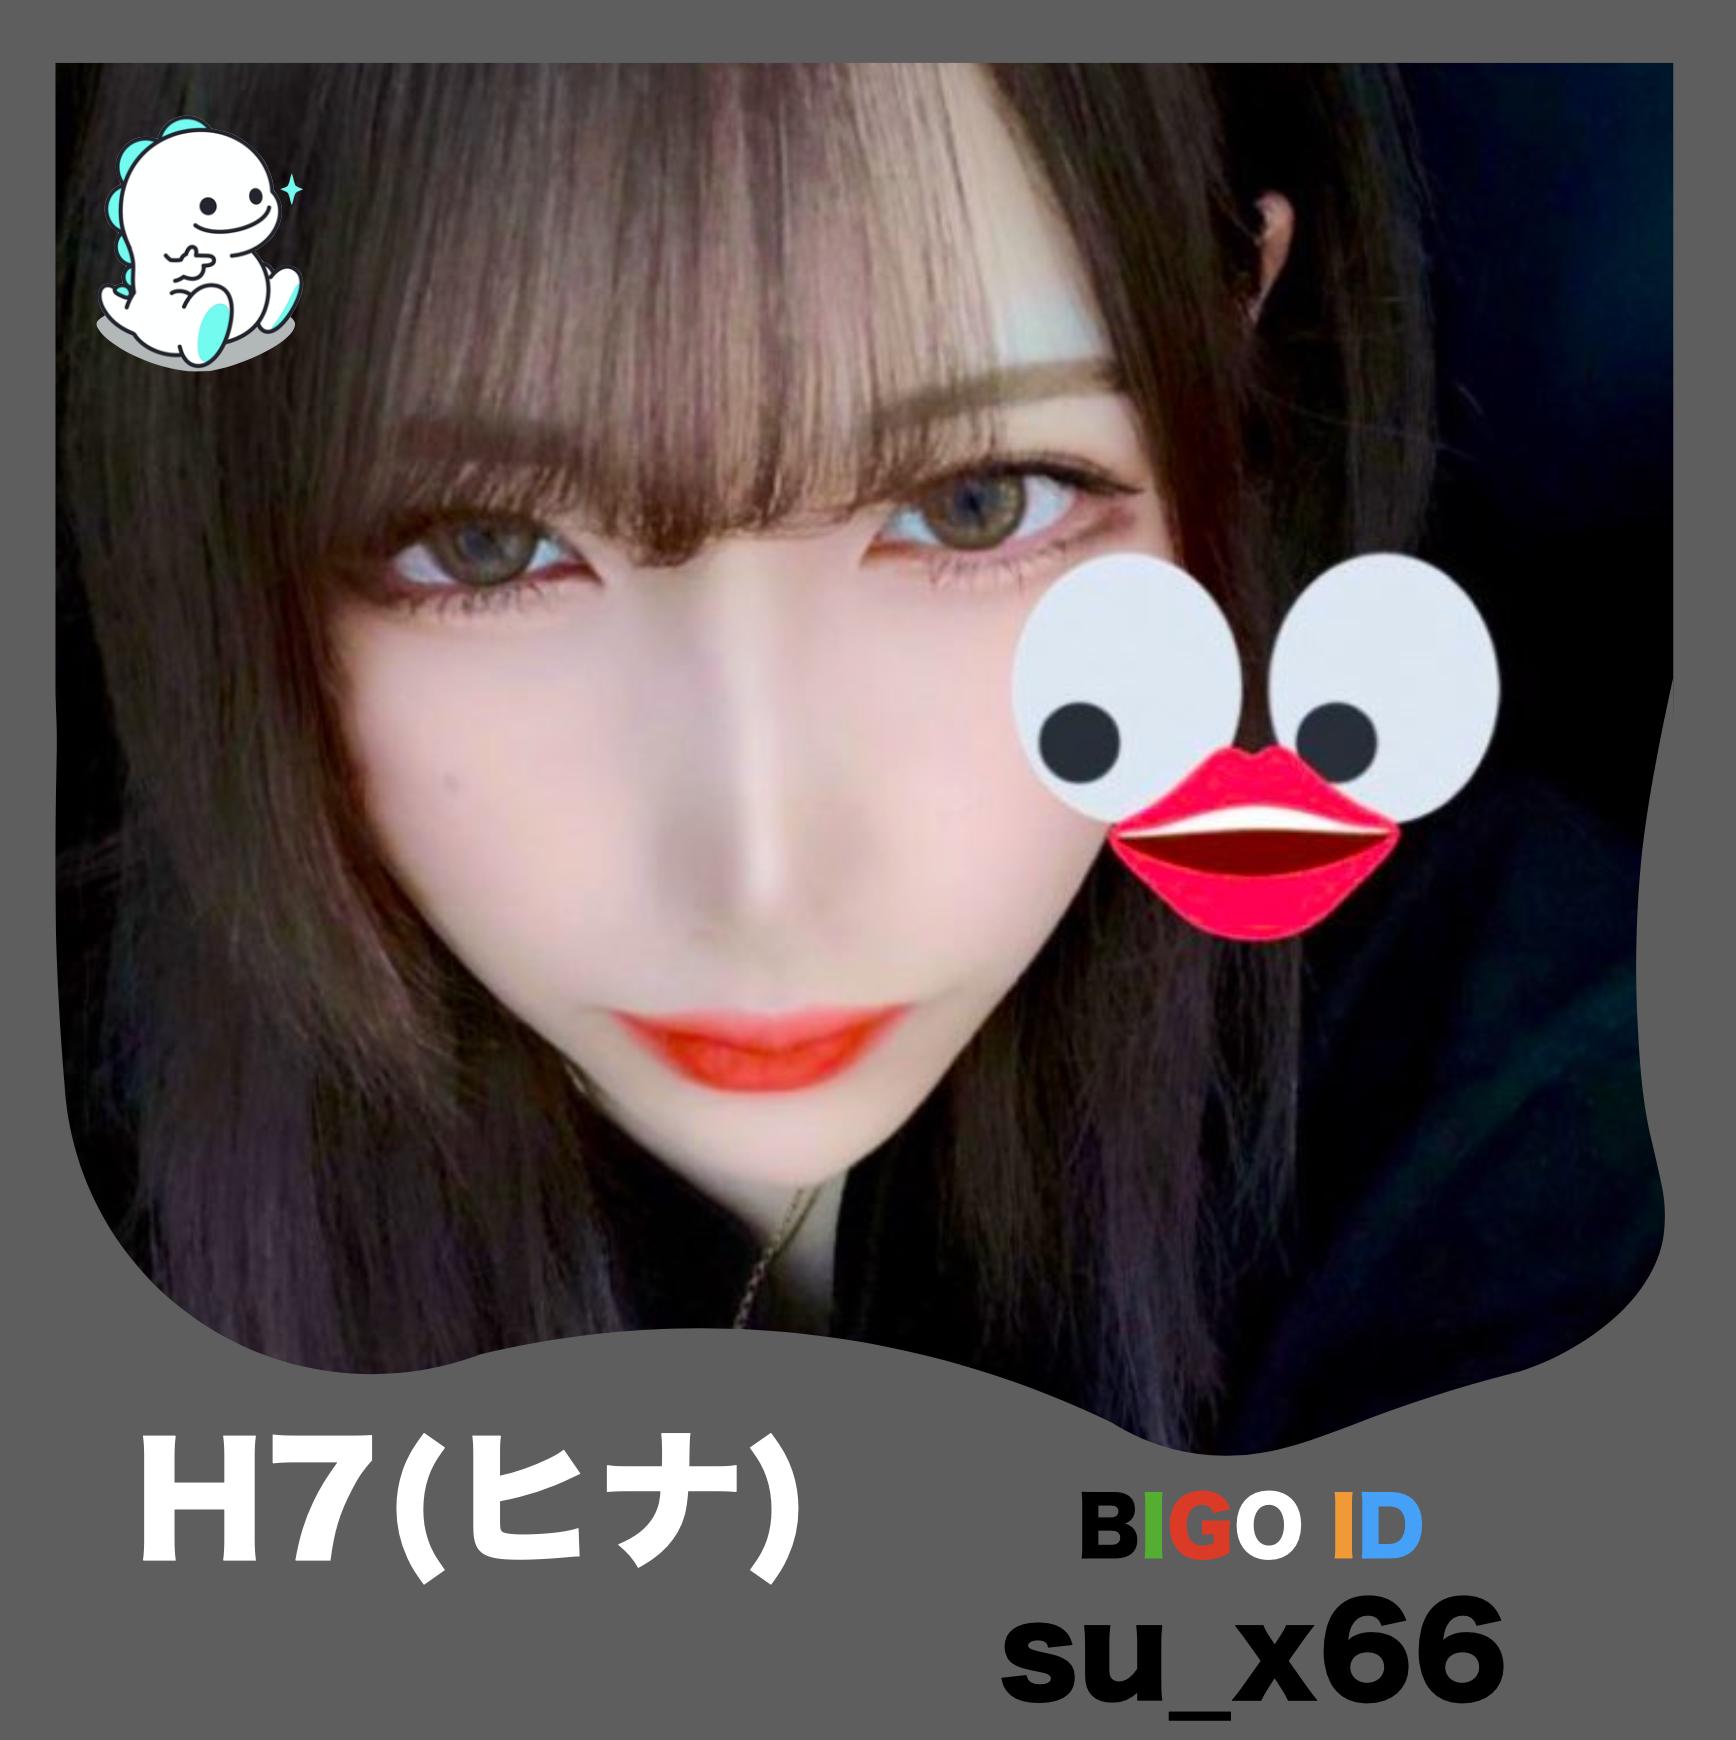 H7(ヒナ)